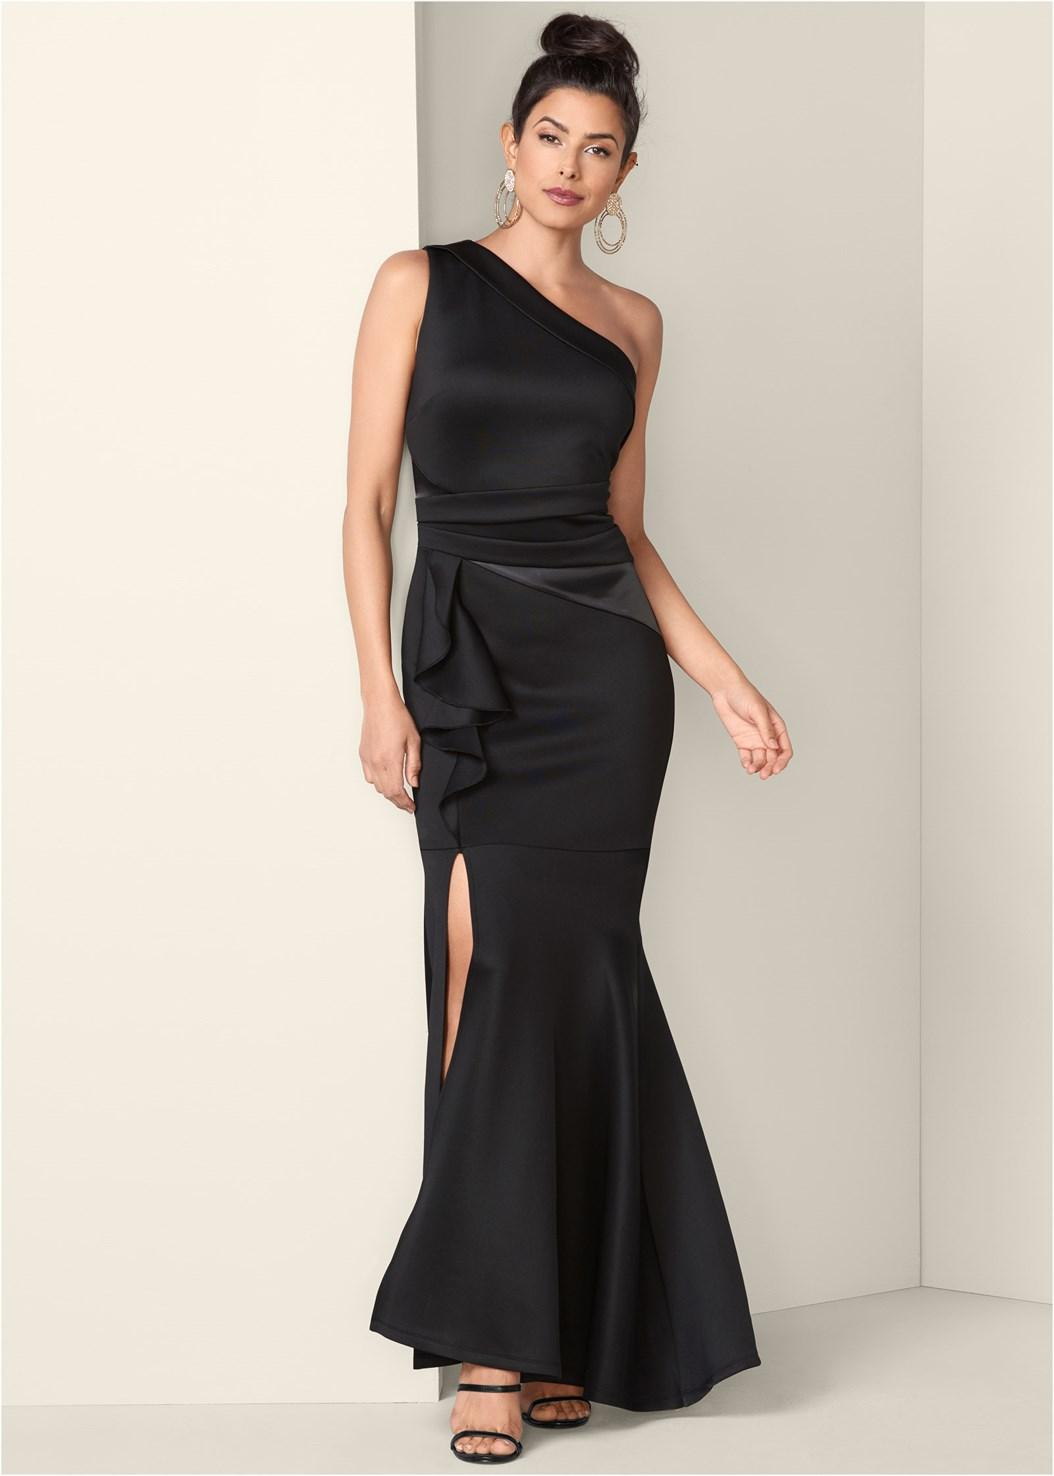 One Shoulder Long Dress,High Heel Strappy Sandals,Lucite Detail Heels